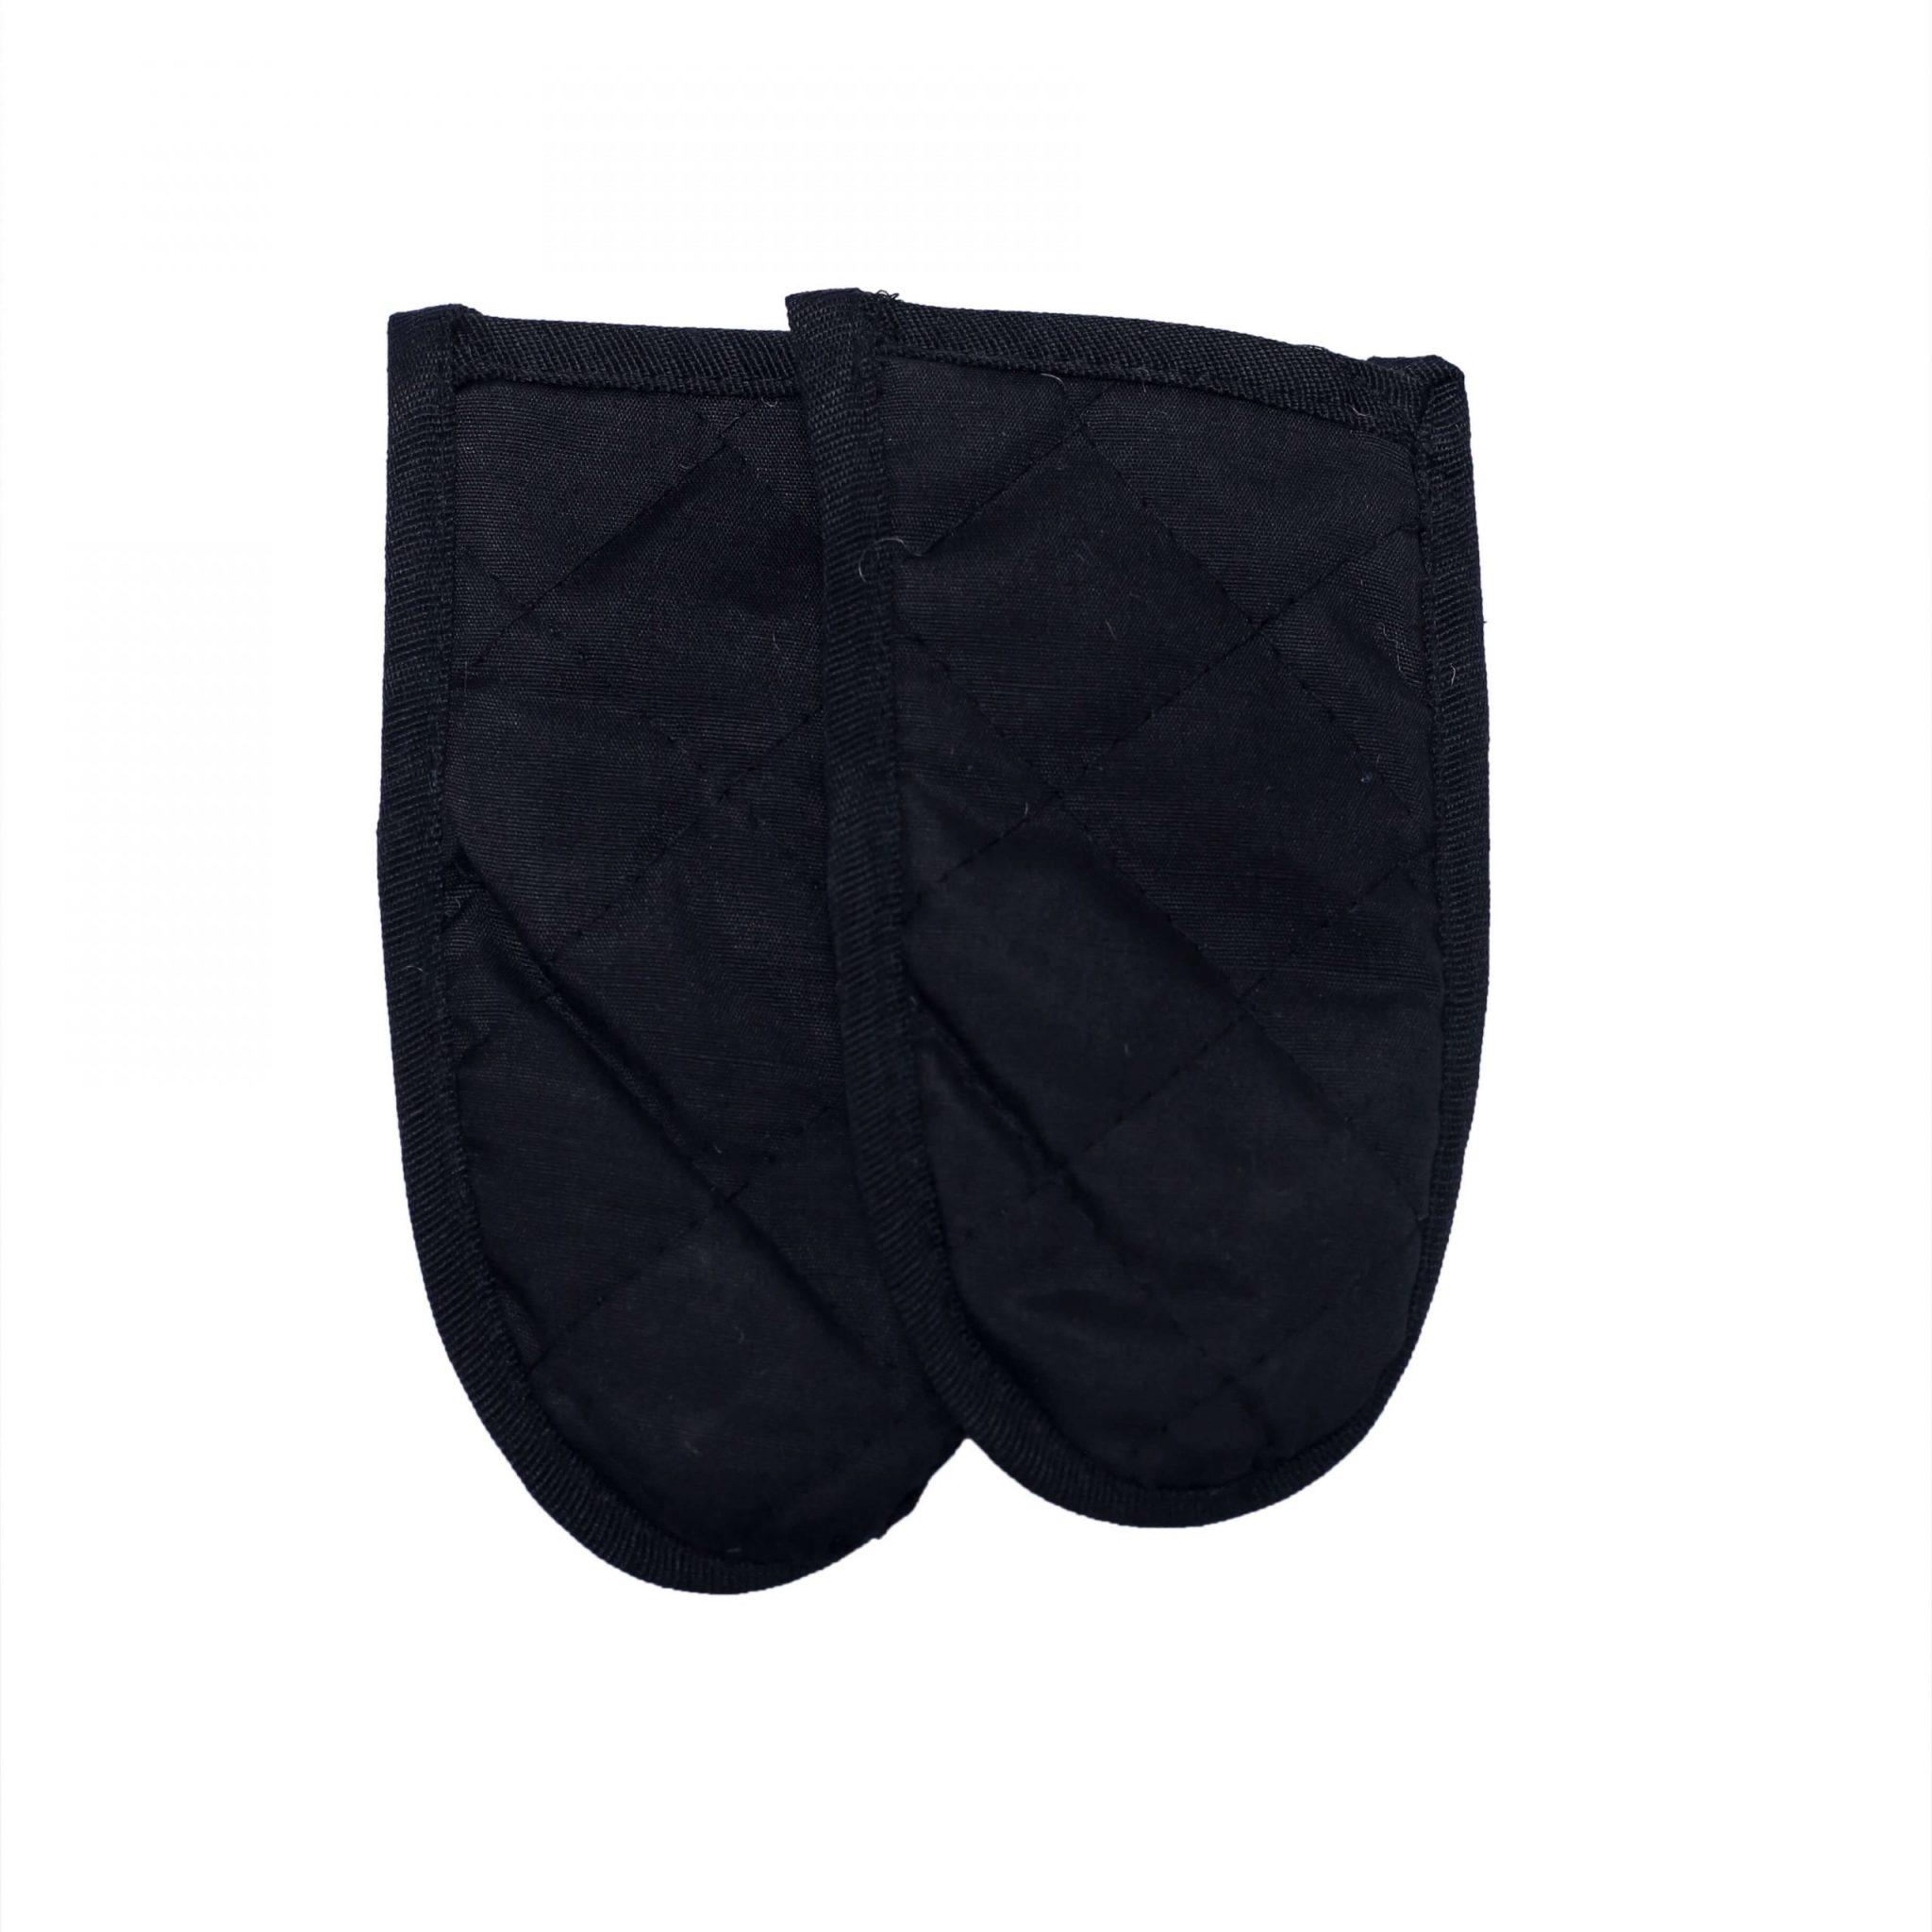 professional black hot handle holders